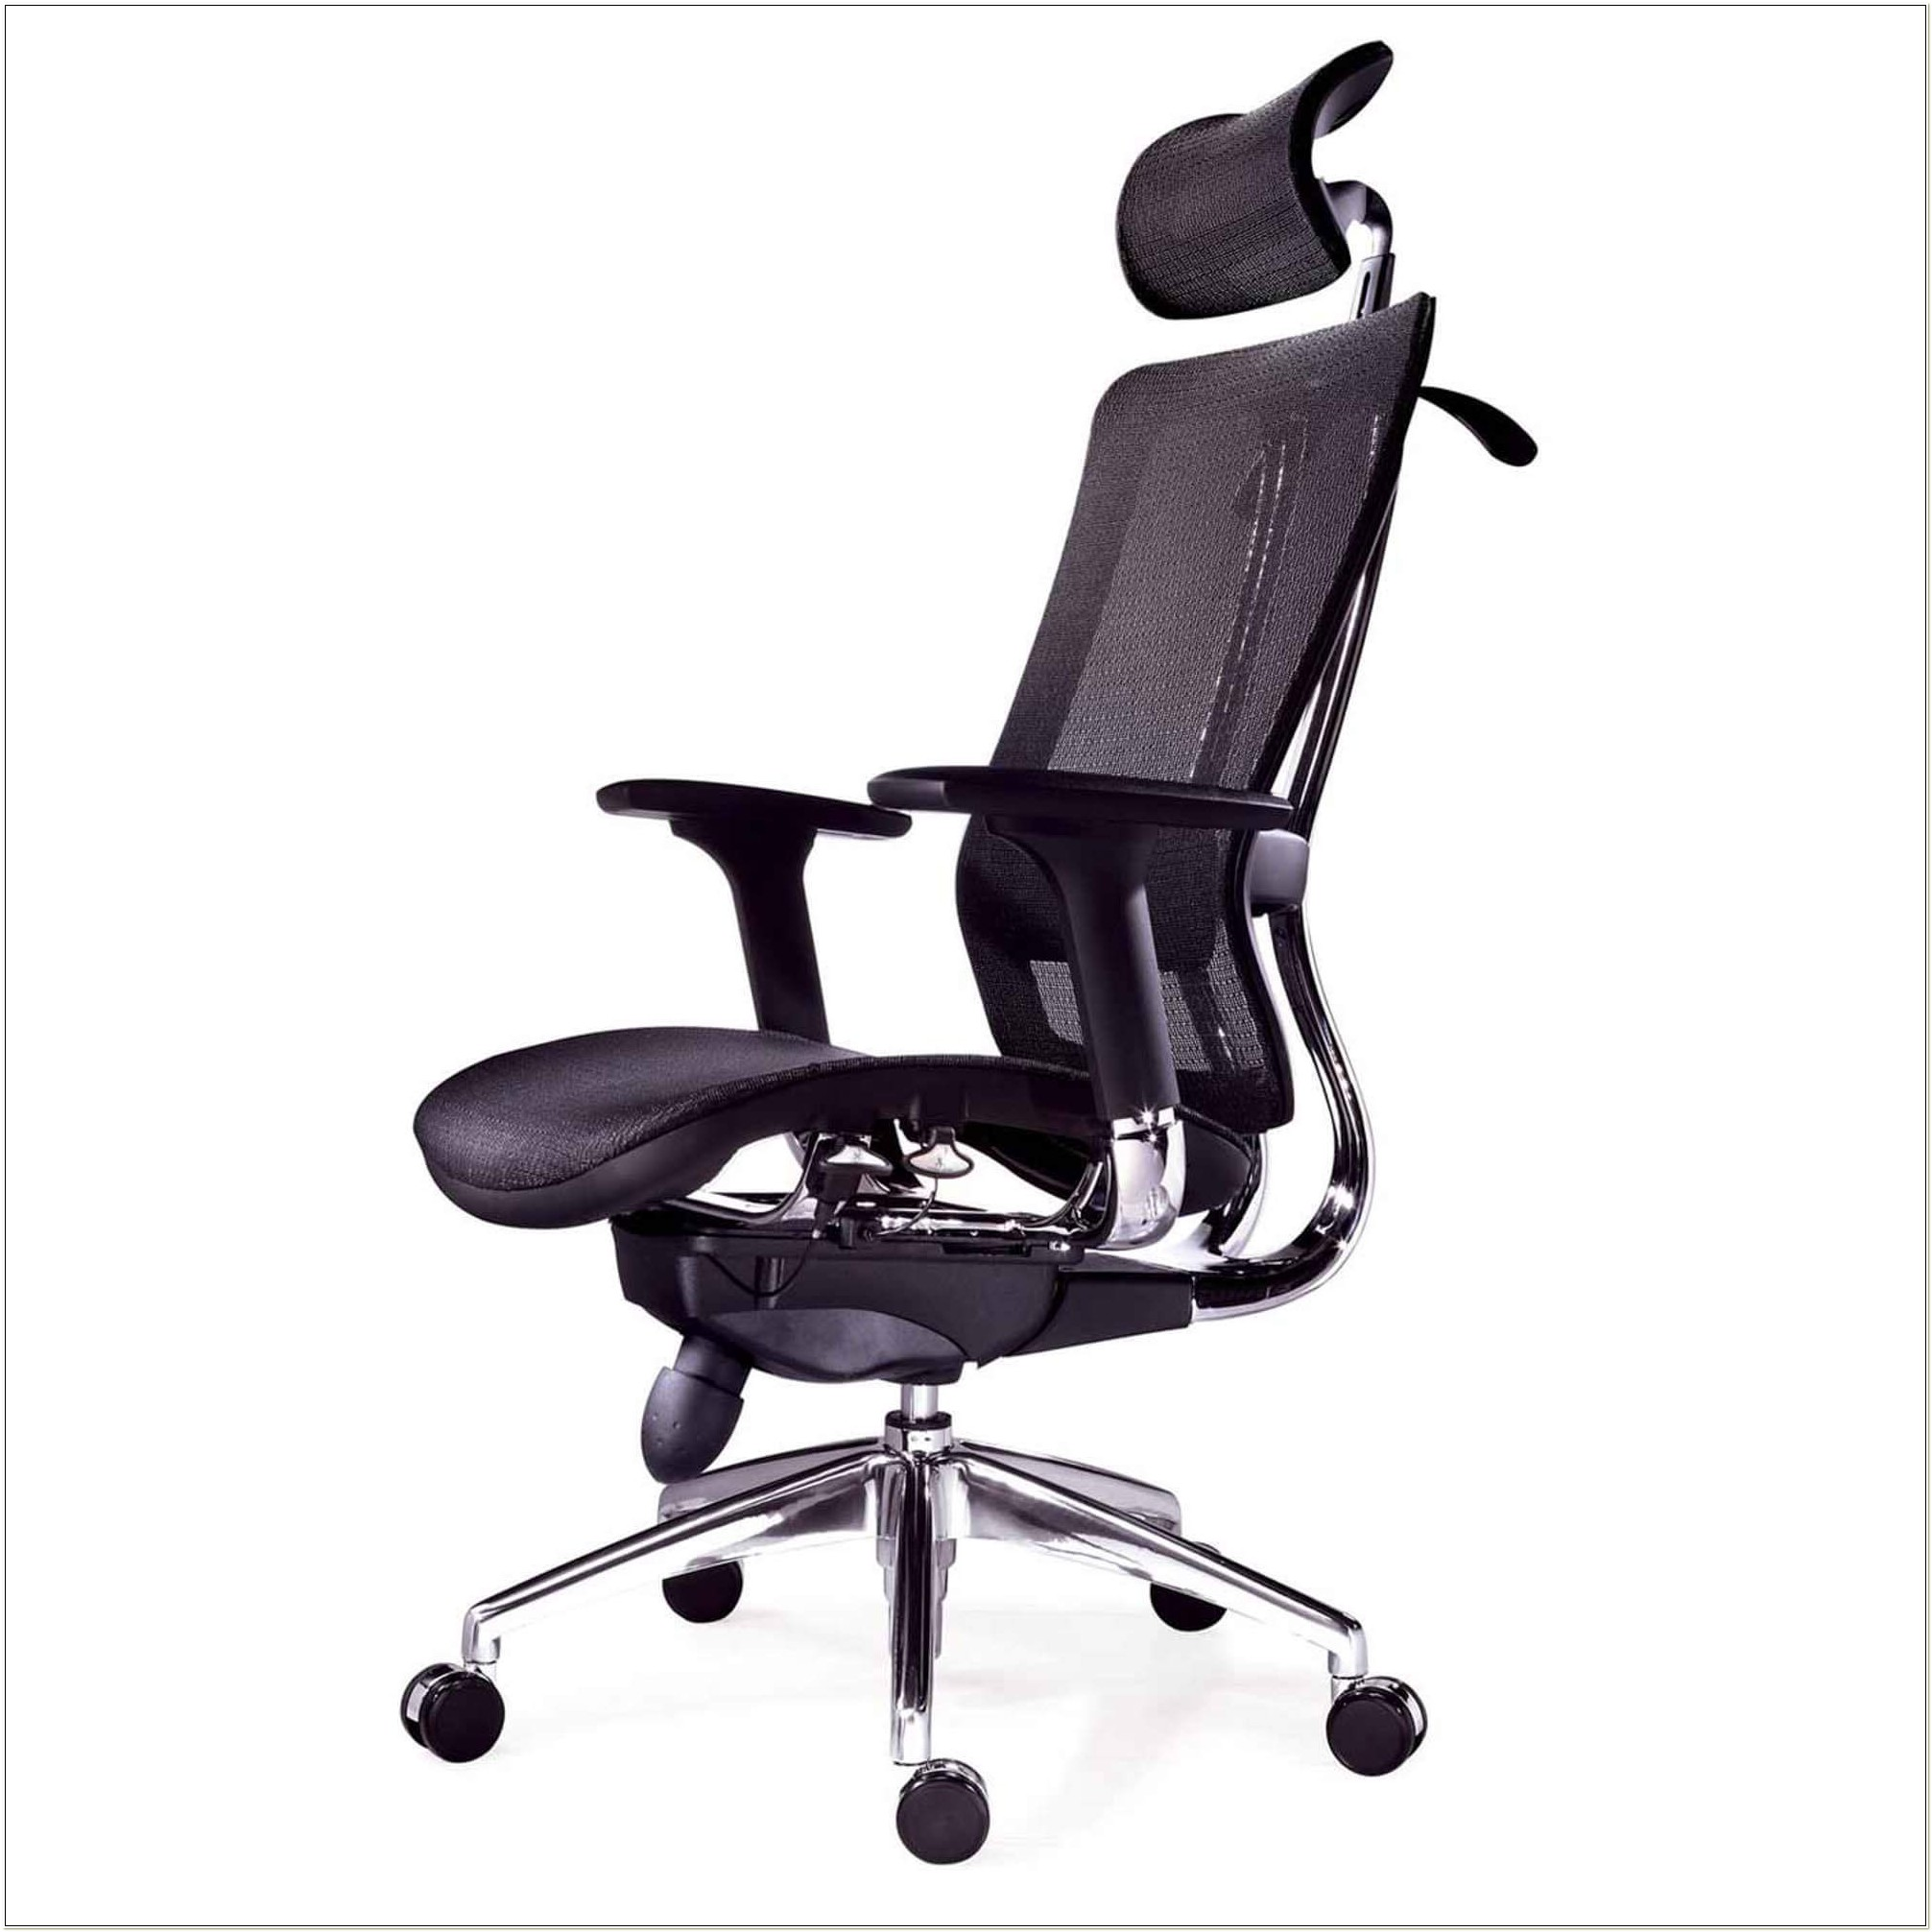 Ergonomic Mesh Swivel Wheeled Office Chair